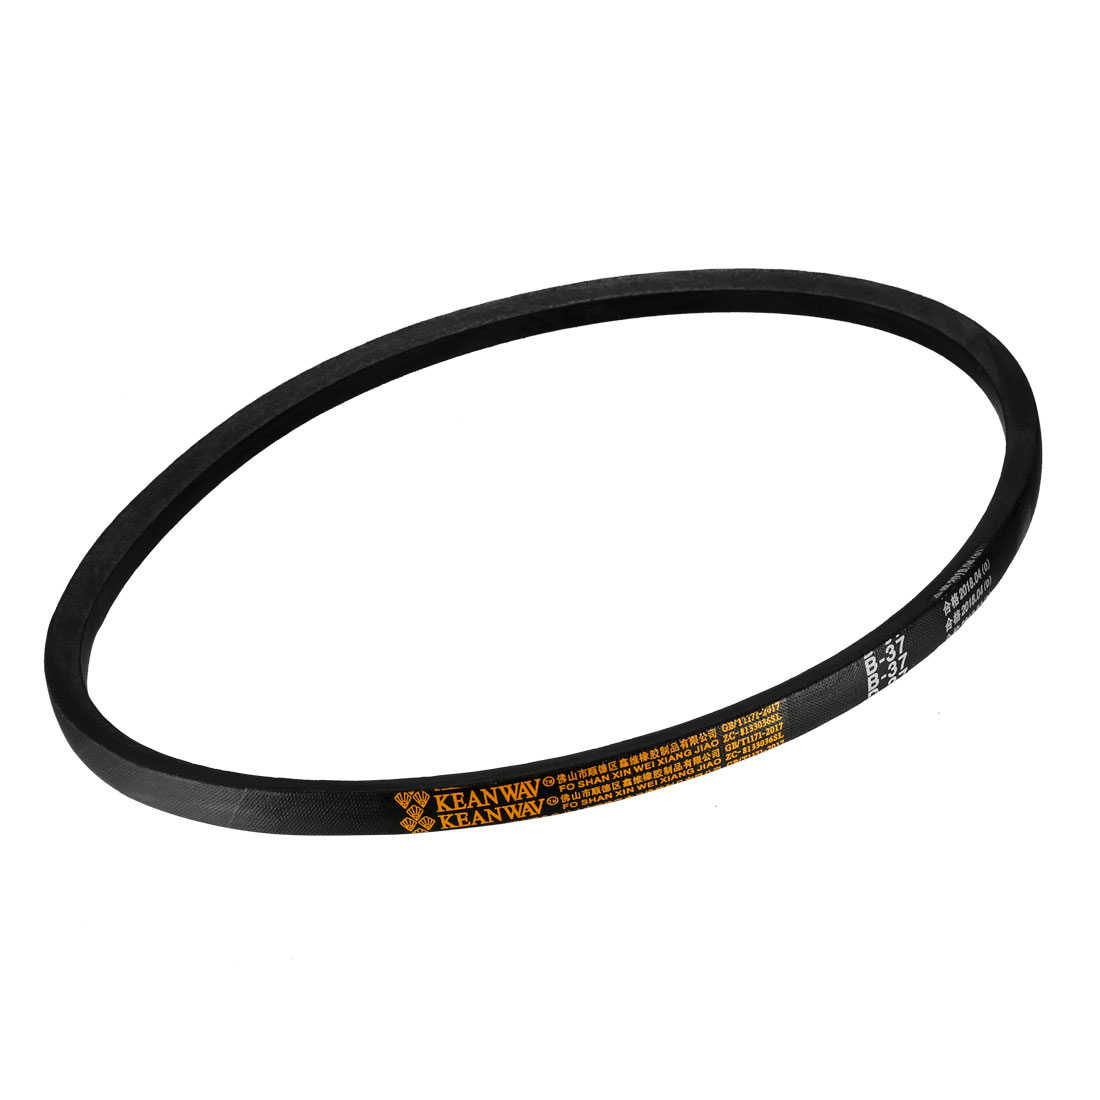 uxcell K Type 21-inch Girth Machine Transmission Band Wedge Rope Vee V Belt